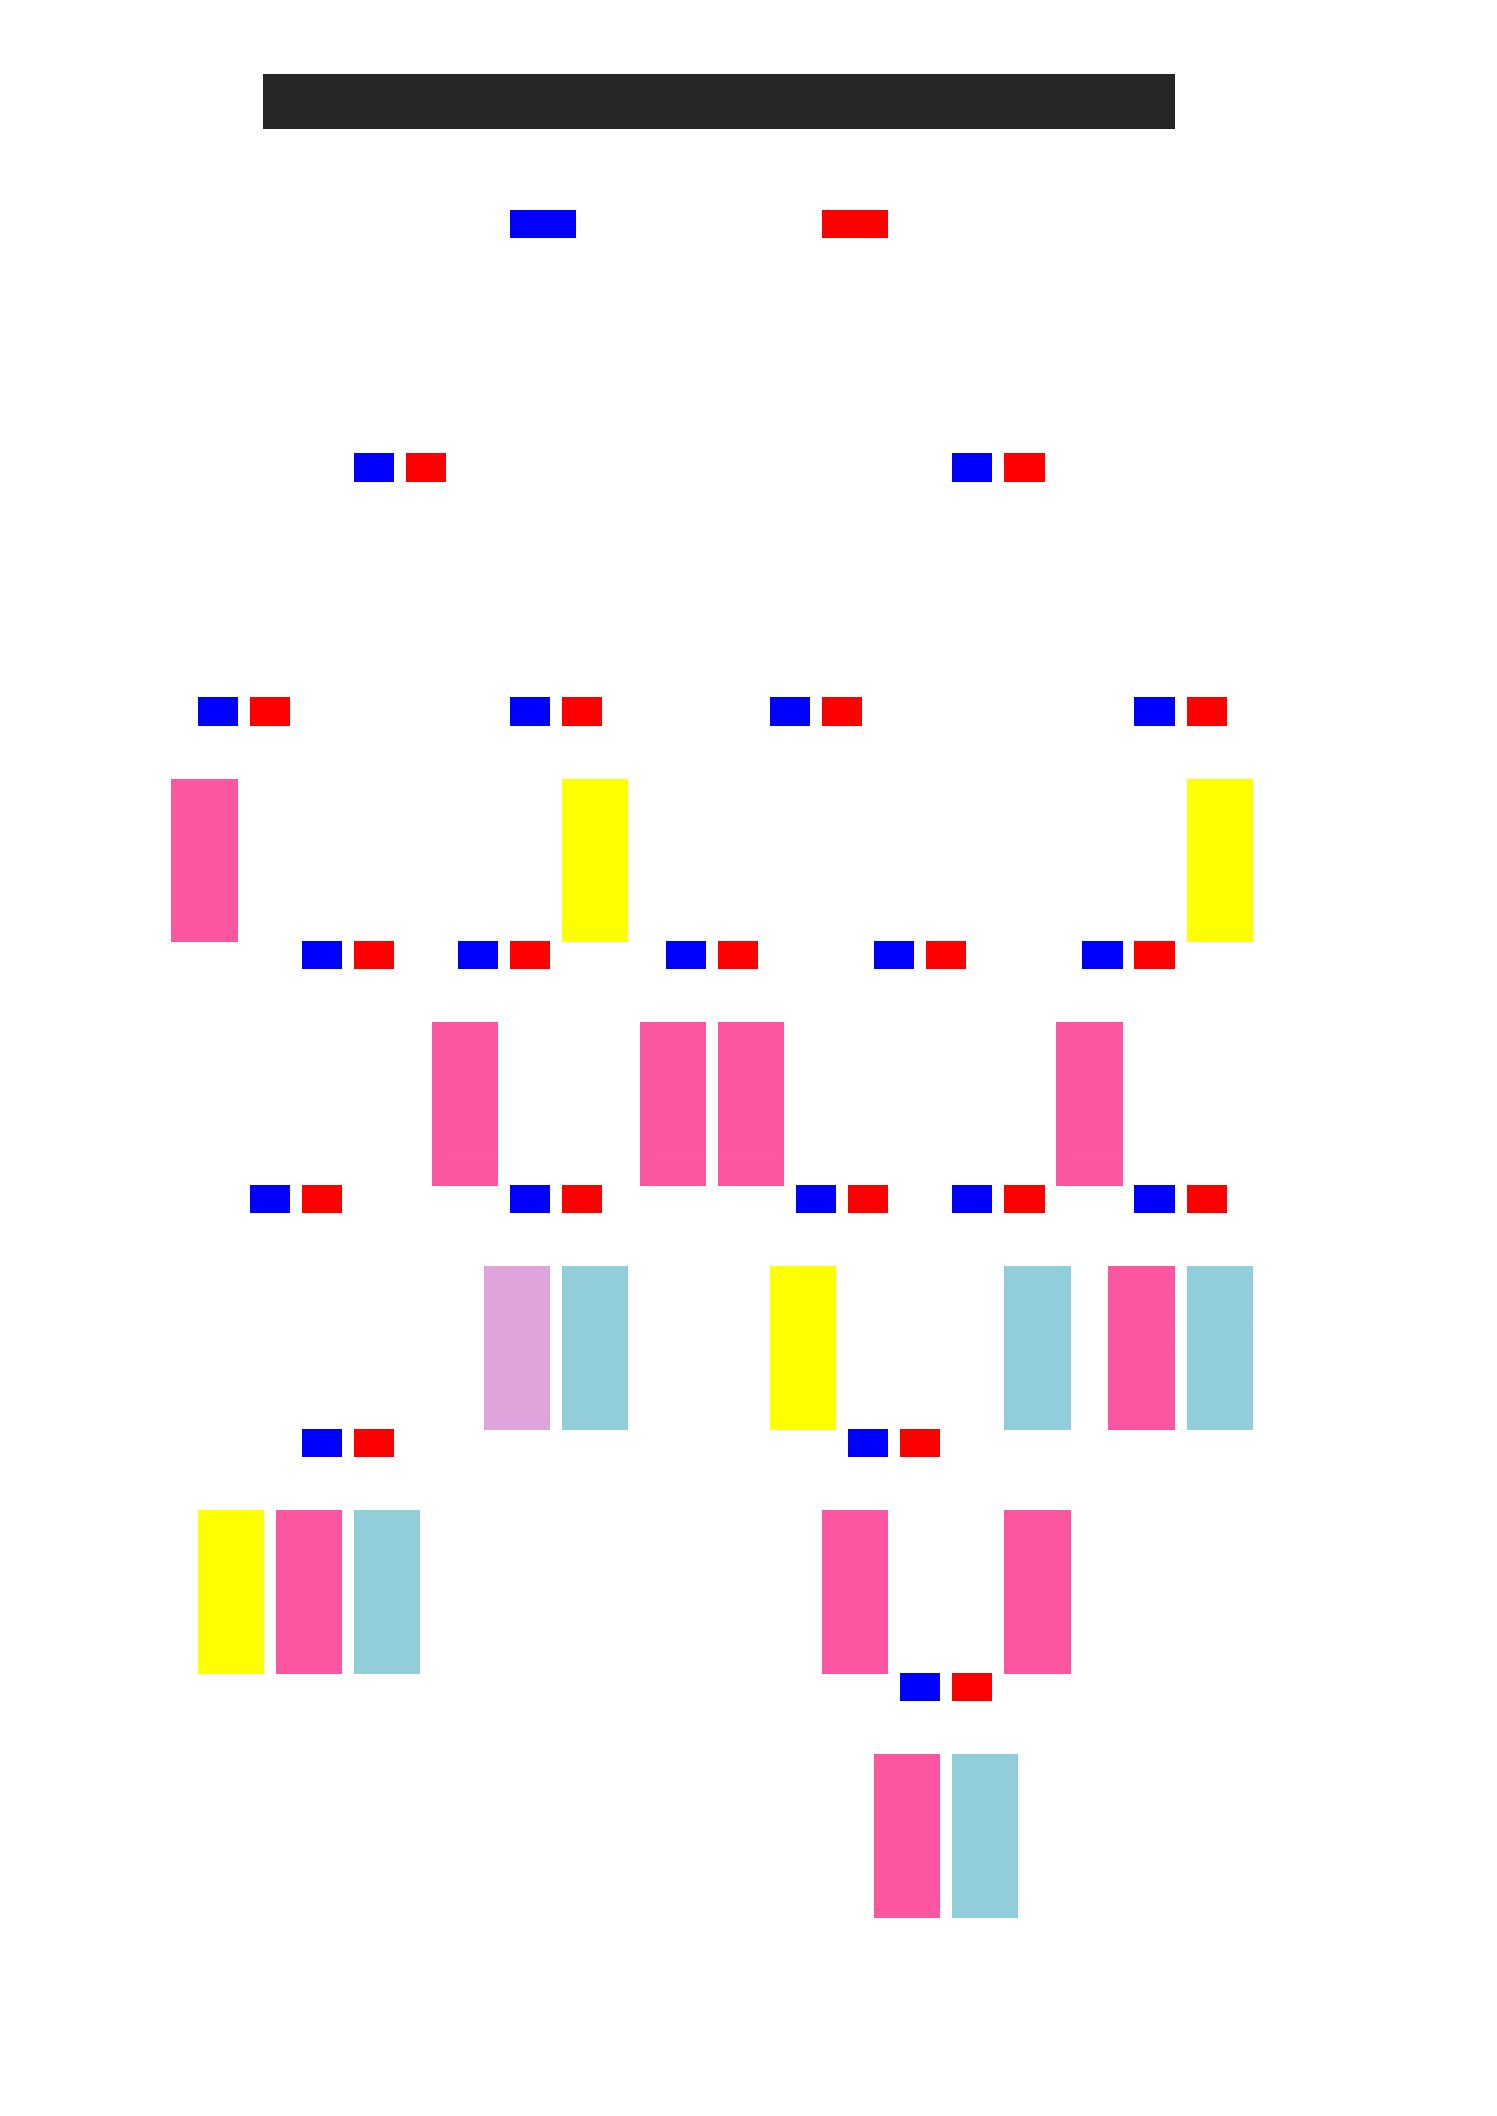 miniban-flow-chart